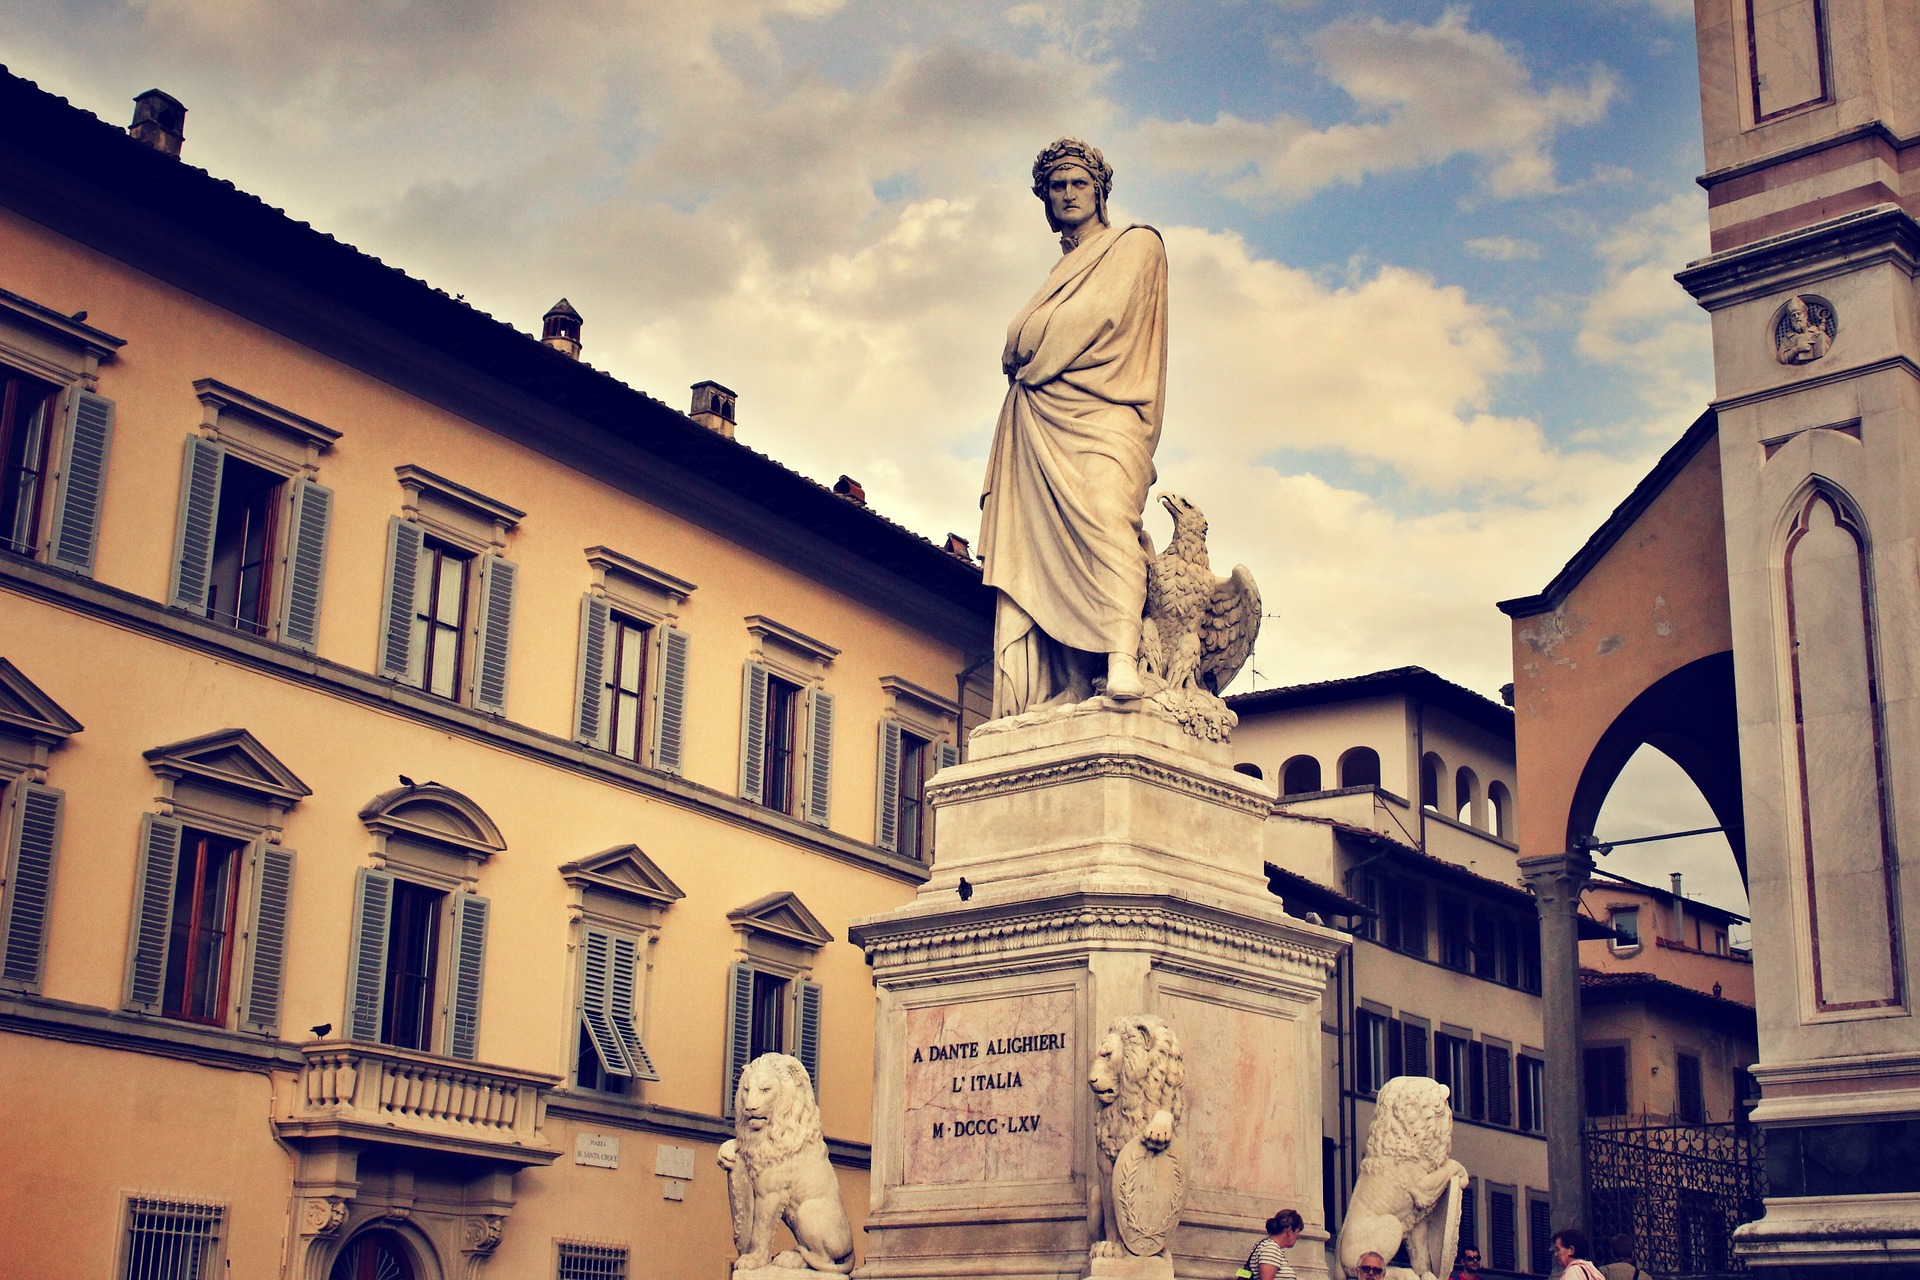 Verona's old city center